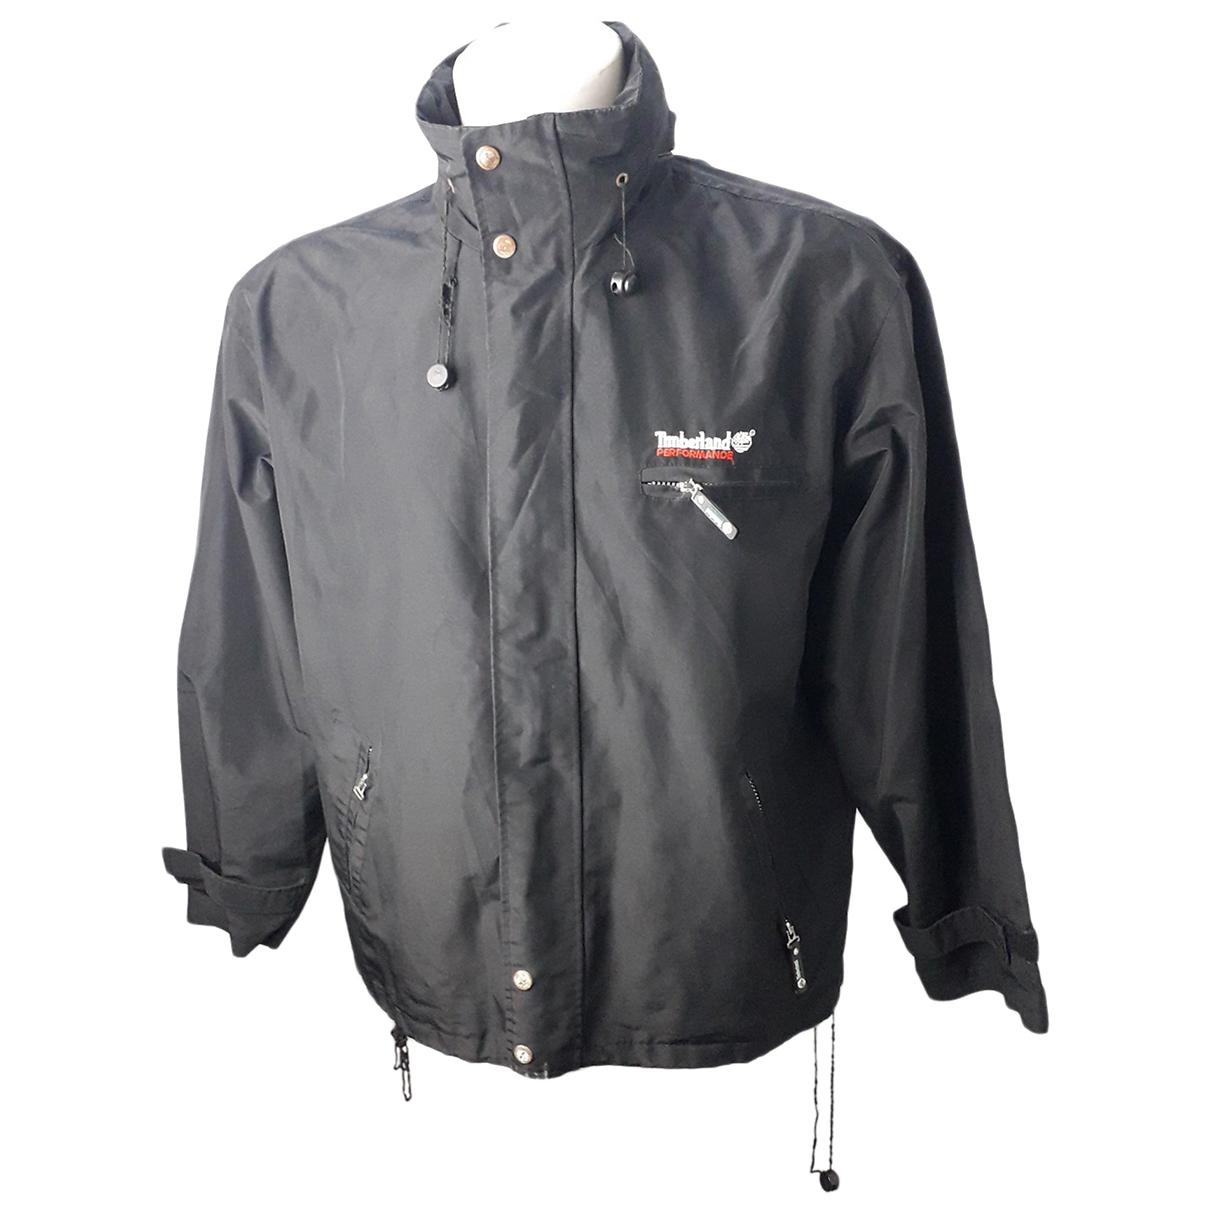 Timberland \N Black jacket  for Men M International